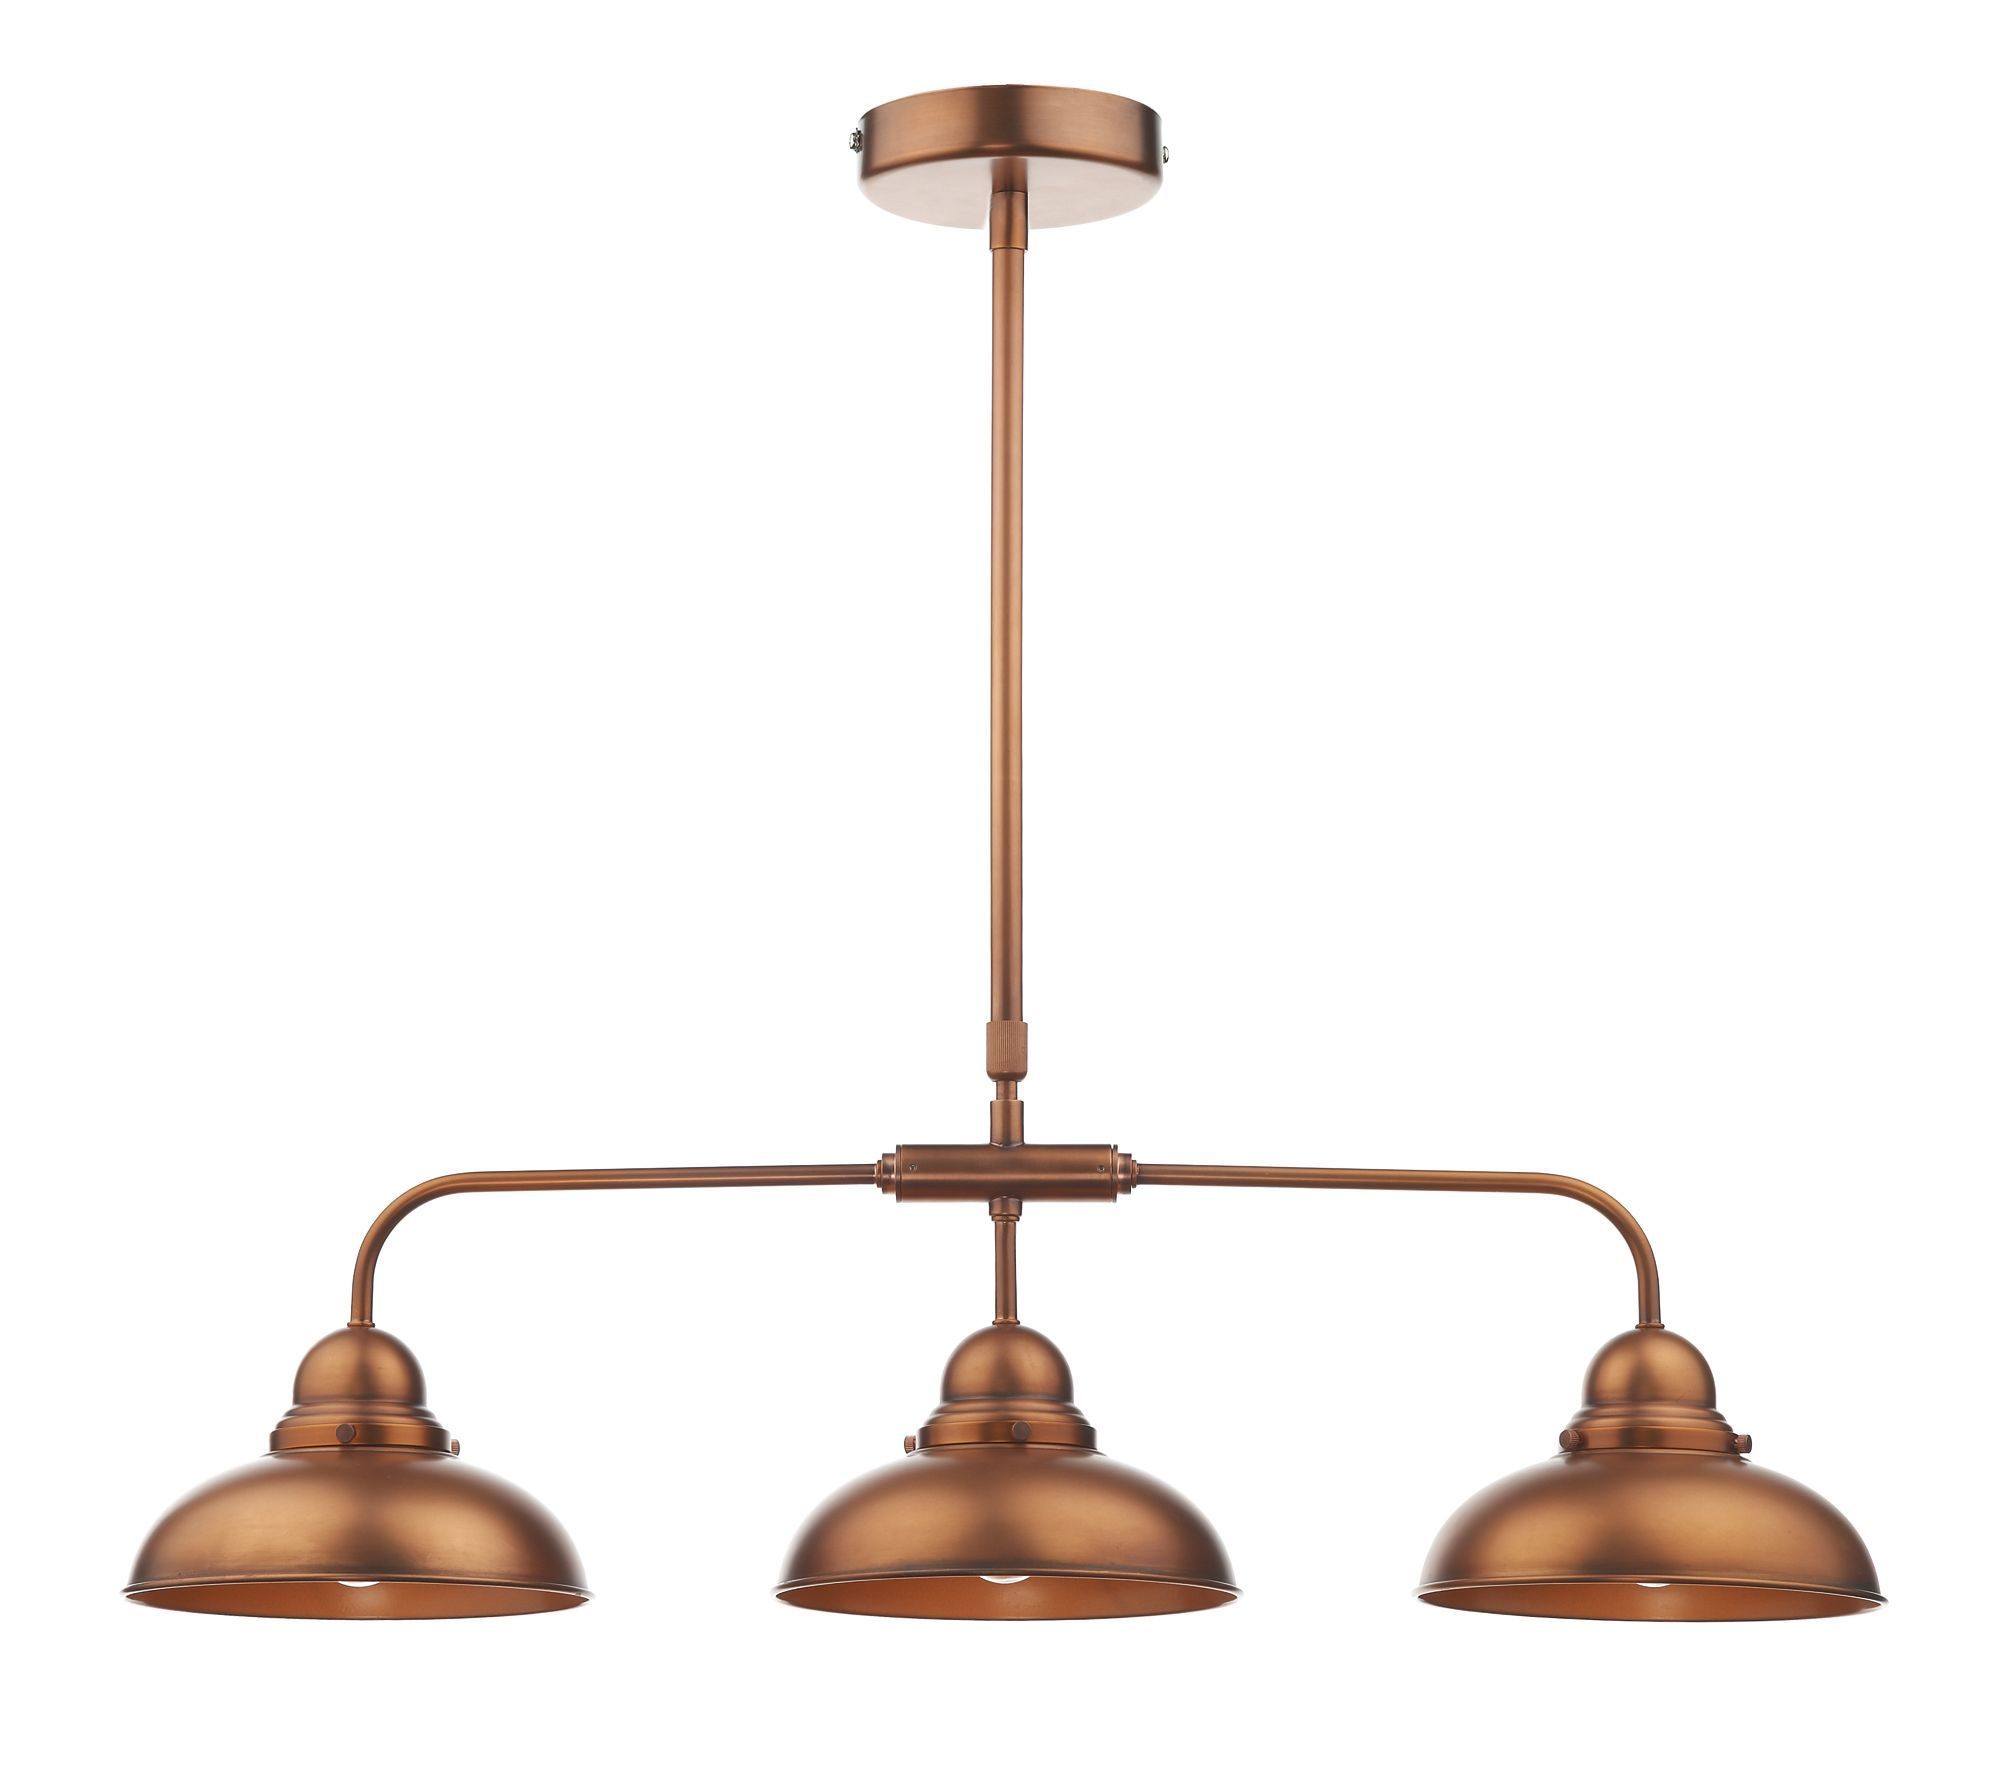 dynamo 3 light bar pendant antique copper class 2 double insulated